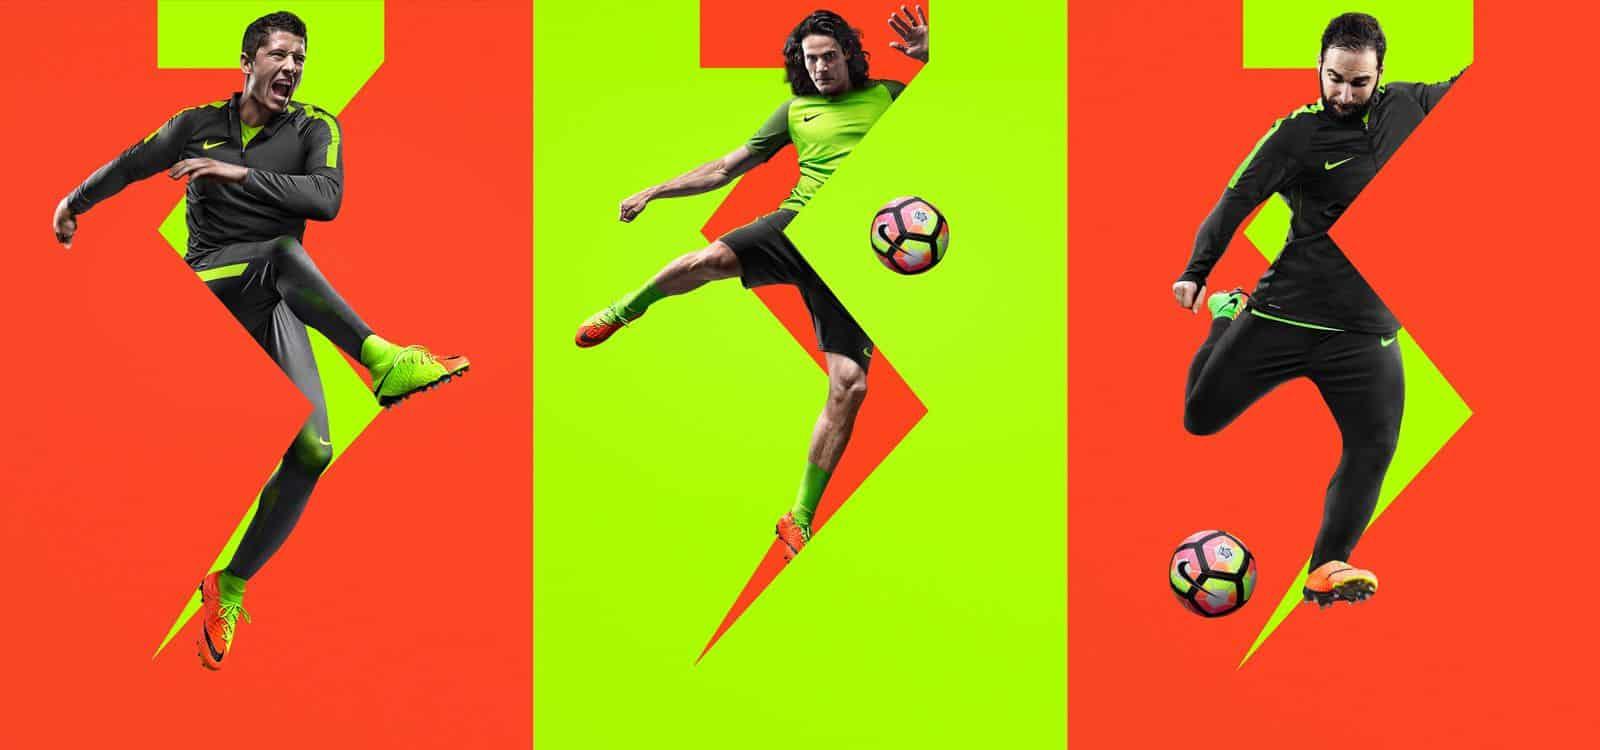 lewandowski-cavani-higuain-hypervenom-3-football-boots_HVIII_DT_p2